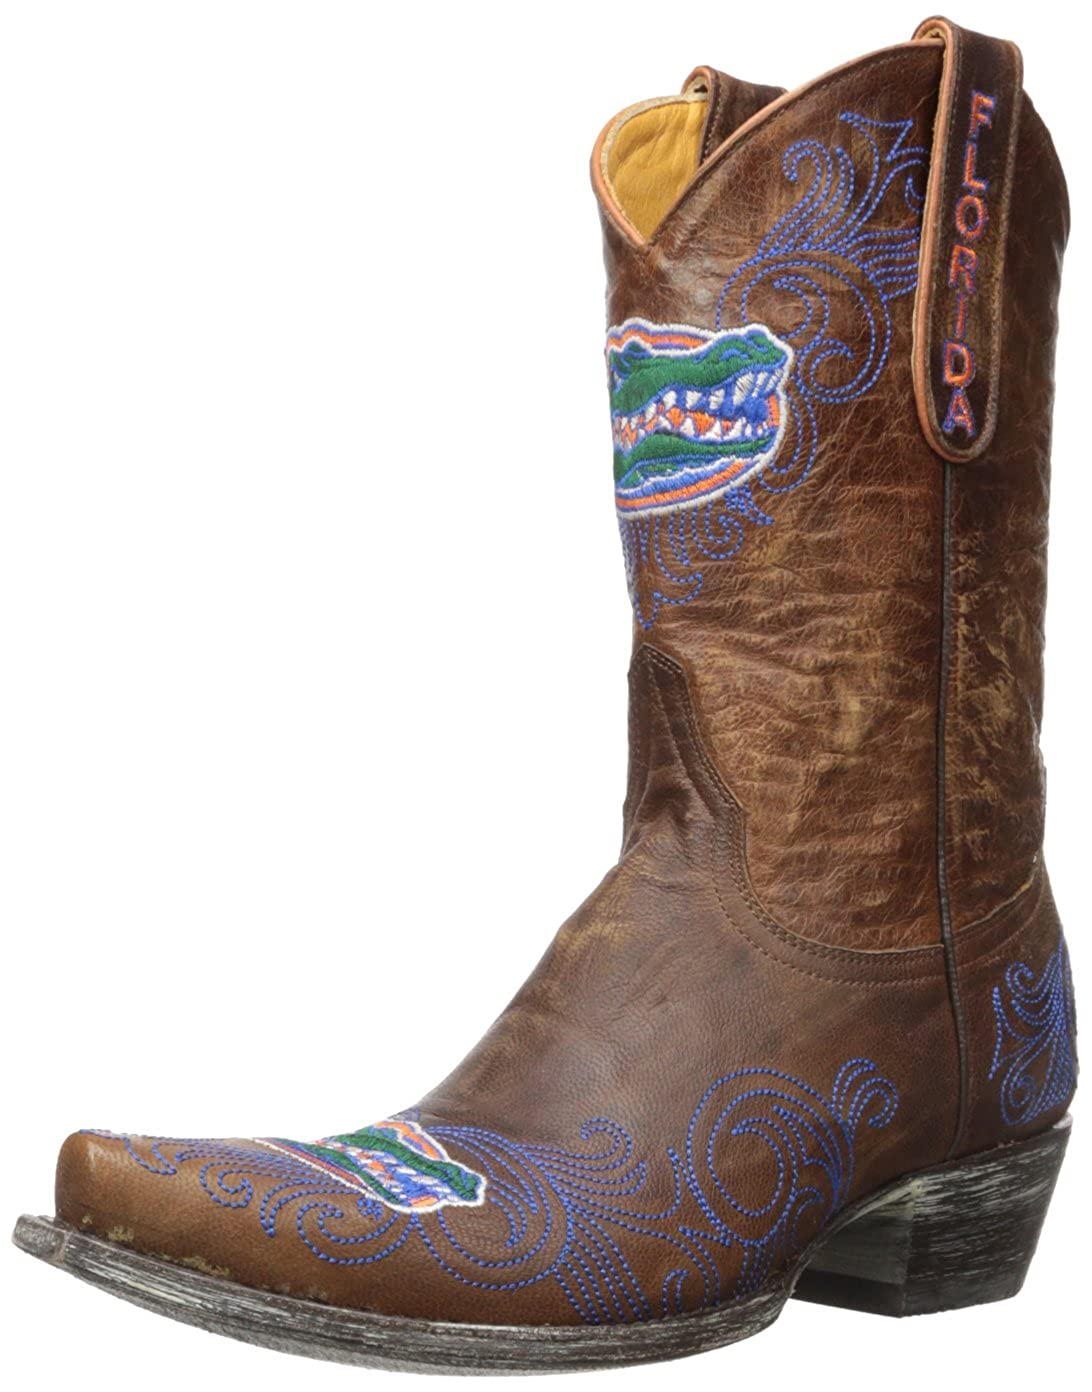 NCAA Florida Gators Womens 10-Inch Gameday Boots